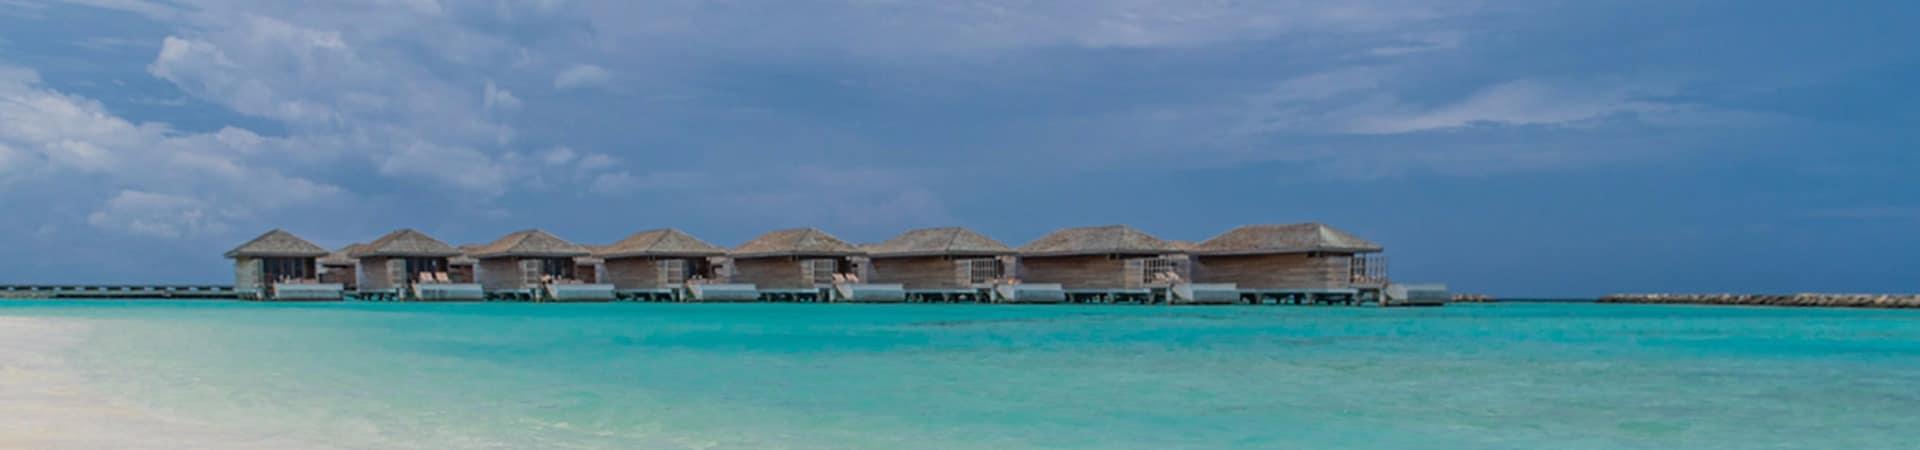 Kagi maldives villas sobre aguas